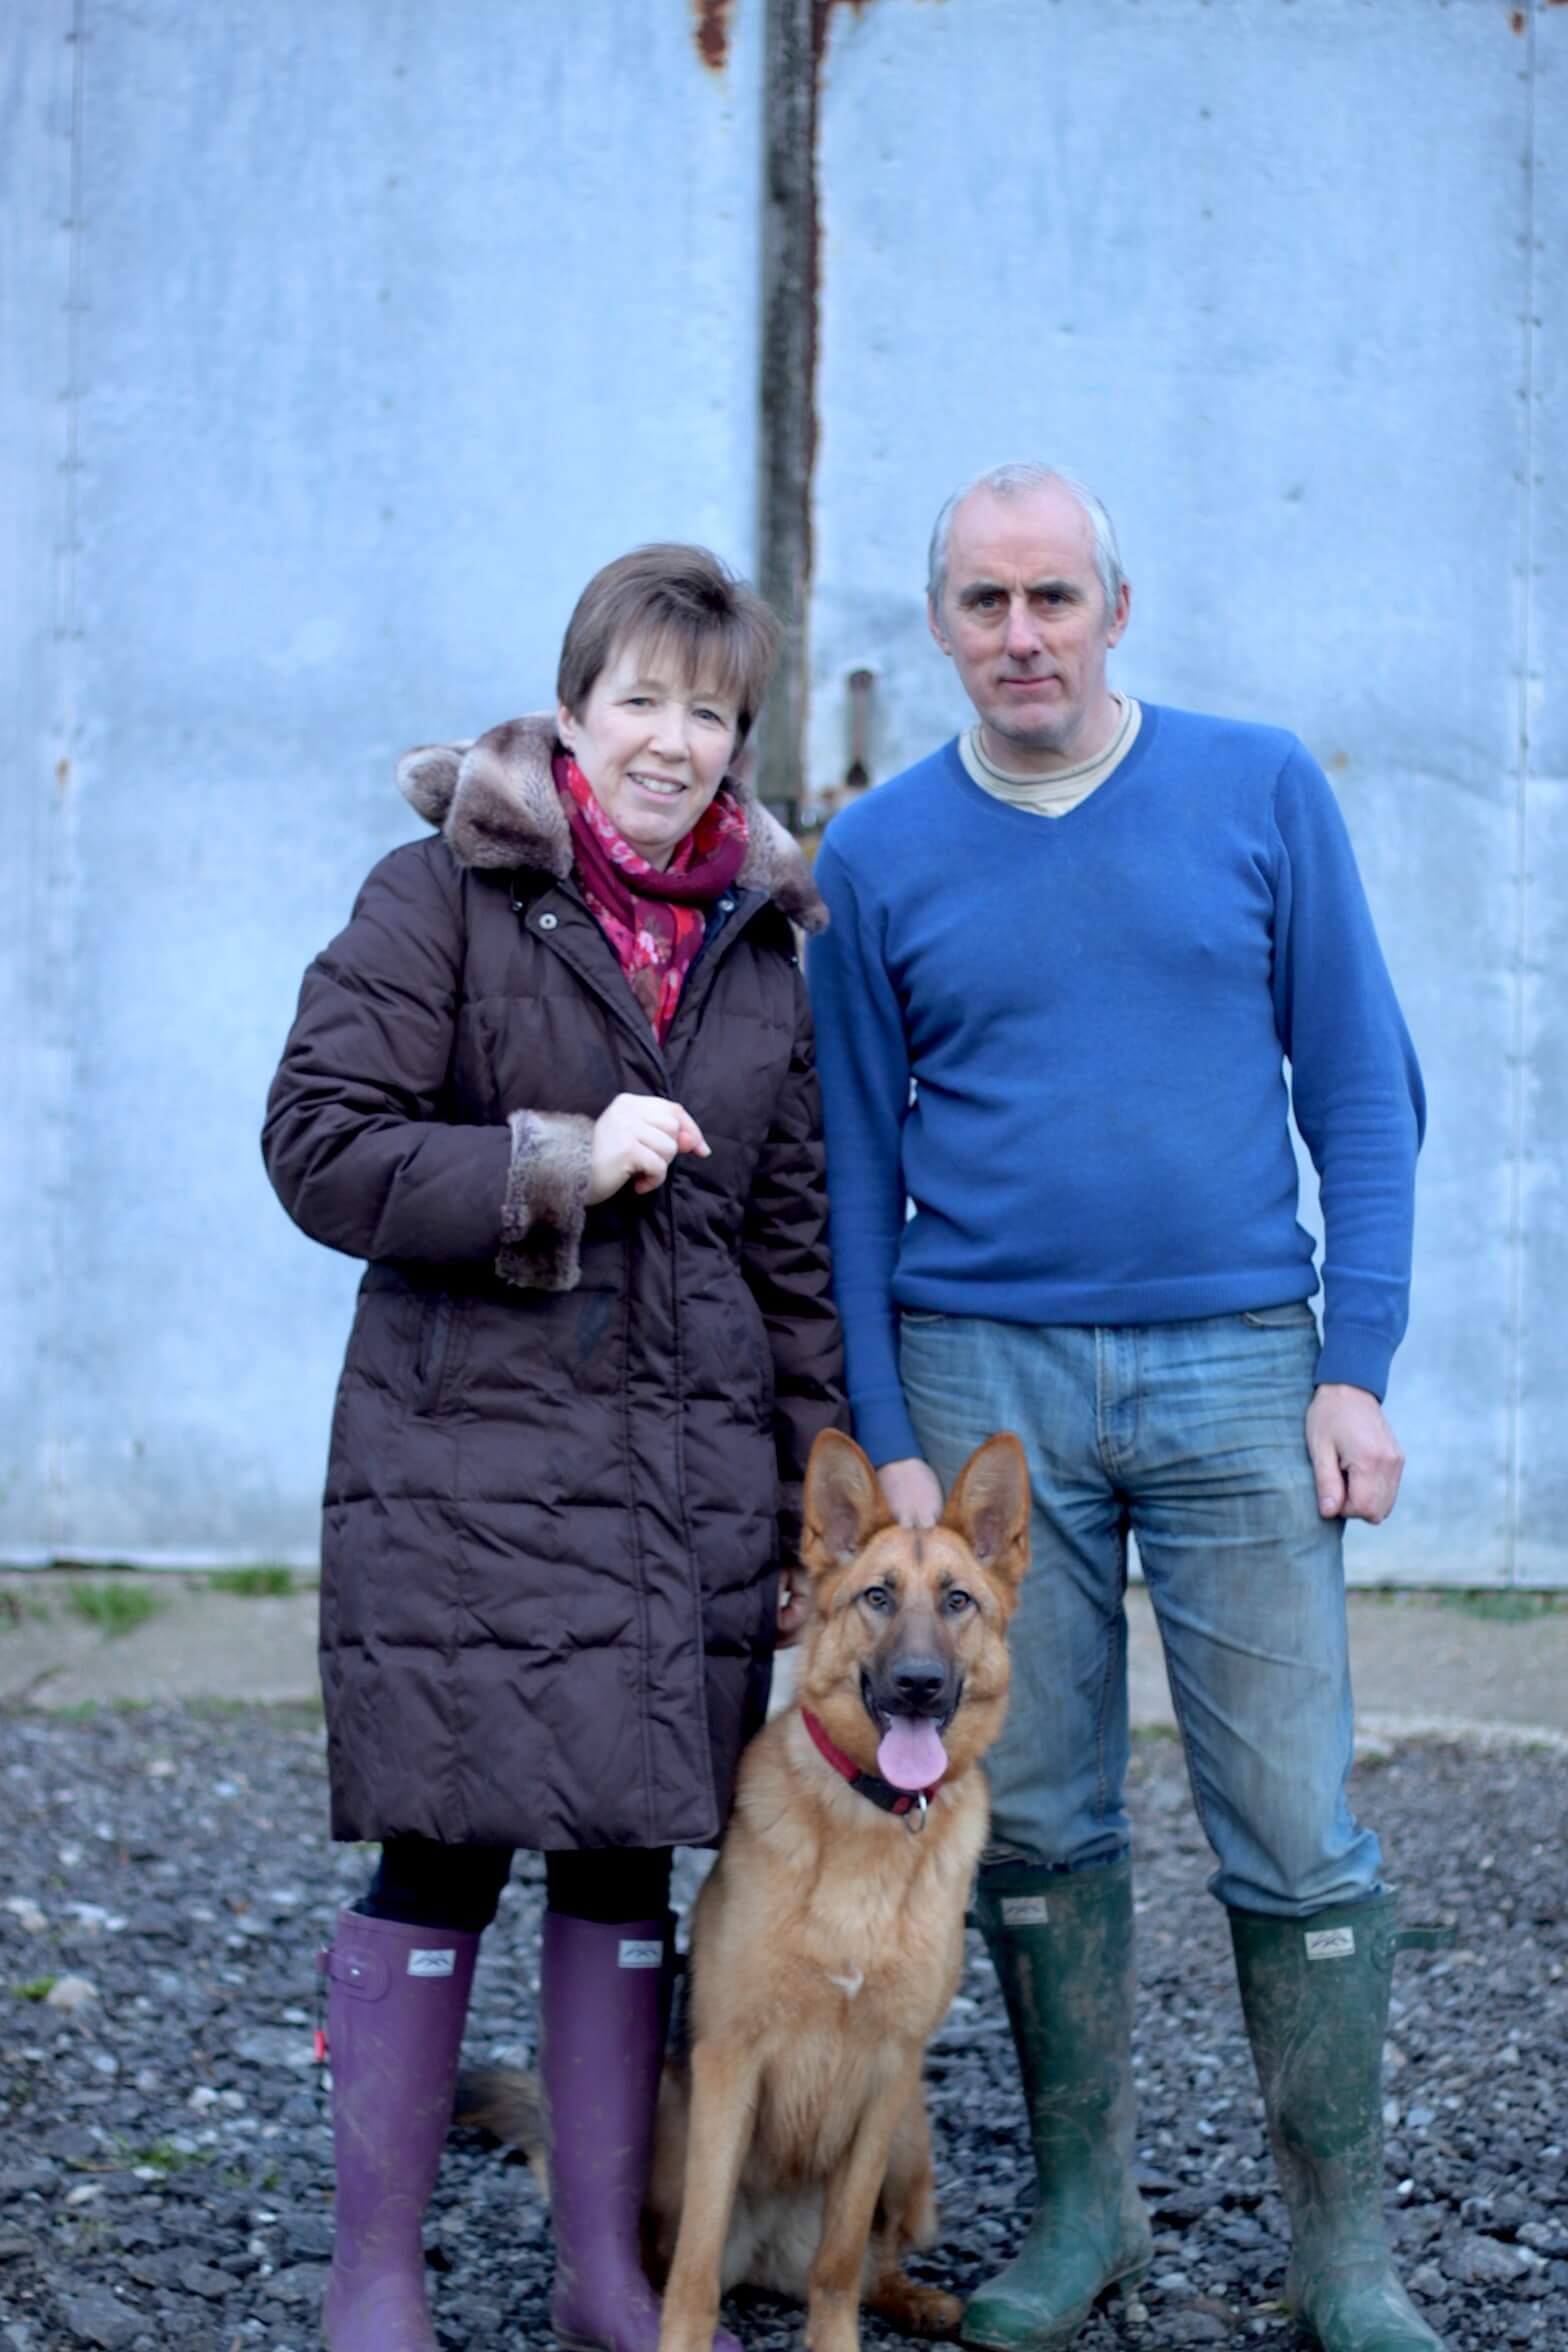 Me, my wife Deborah and dog Nellie